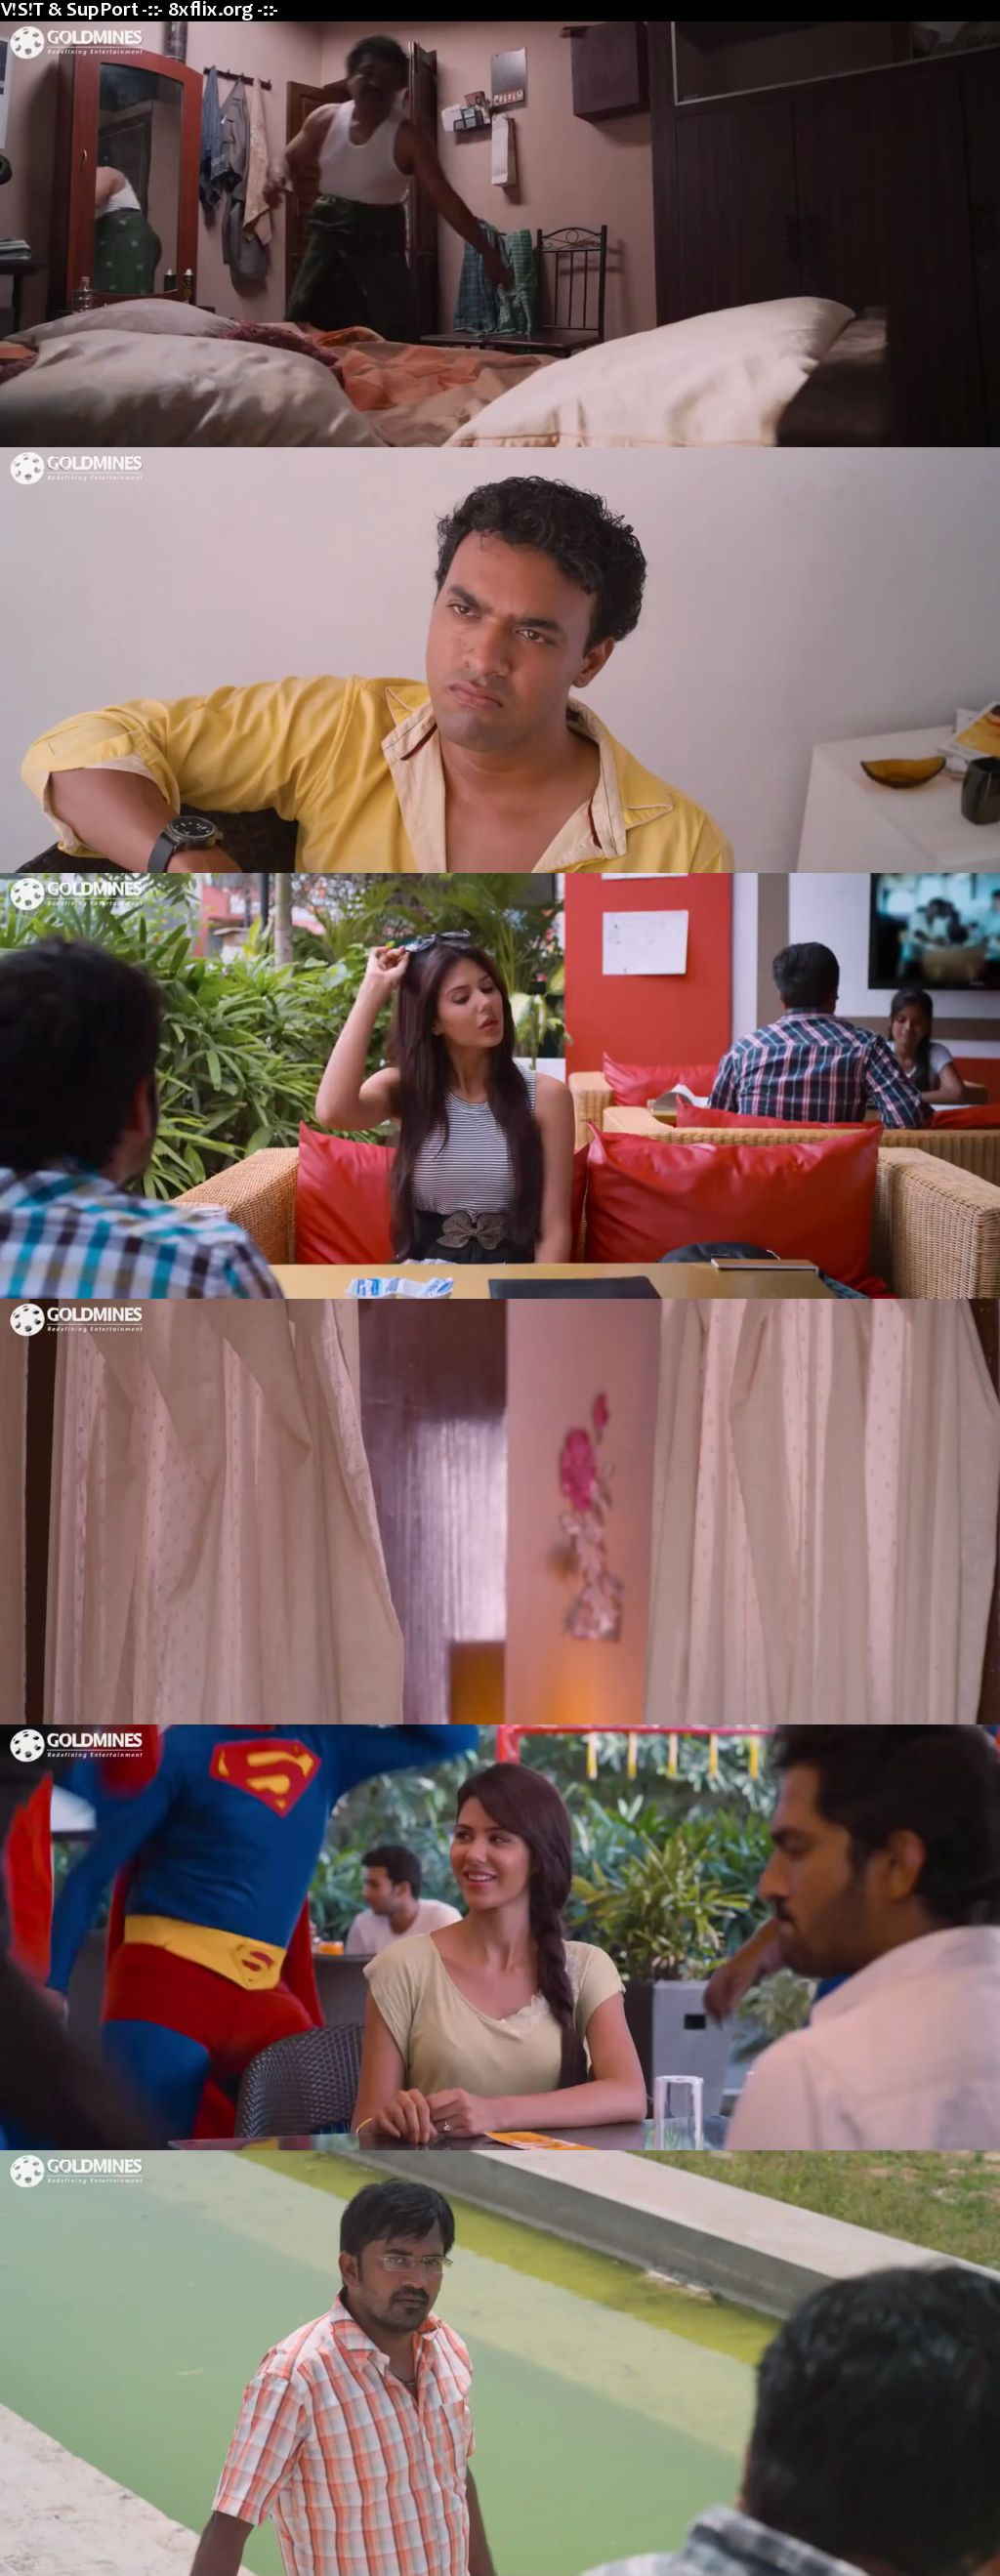 Main Hoon Dilwala 2021 Full Movie Hindi Dubbed 720p 480p HDRip